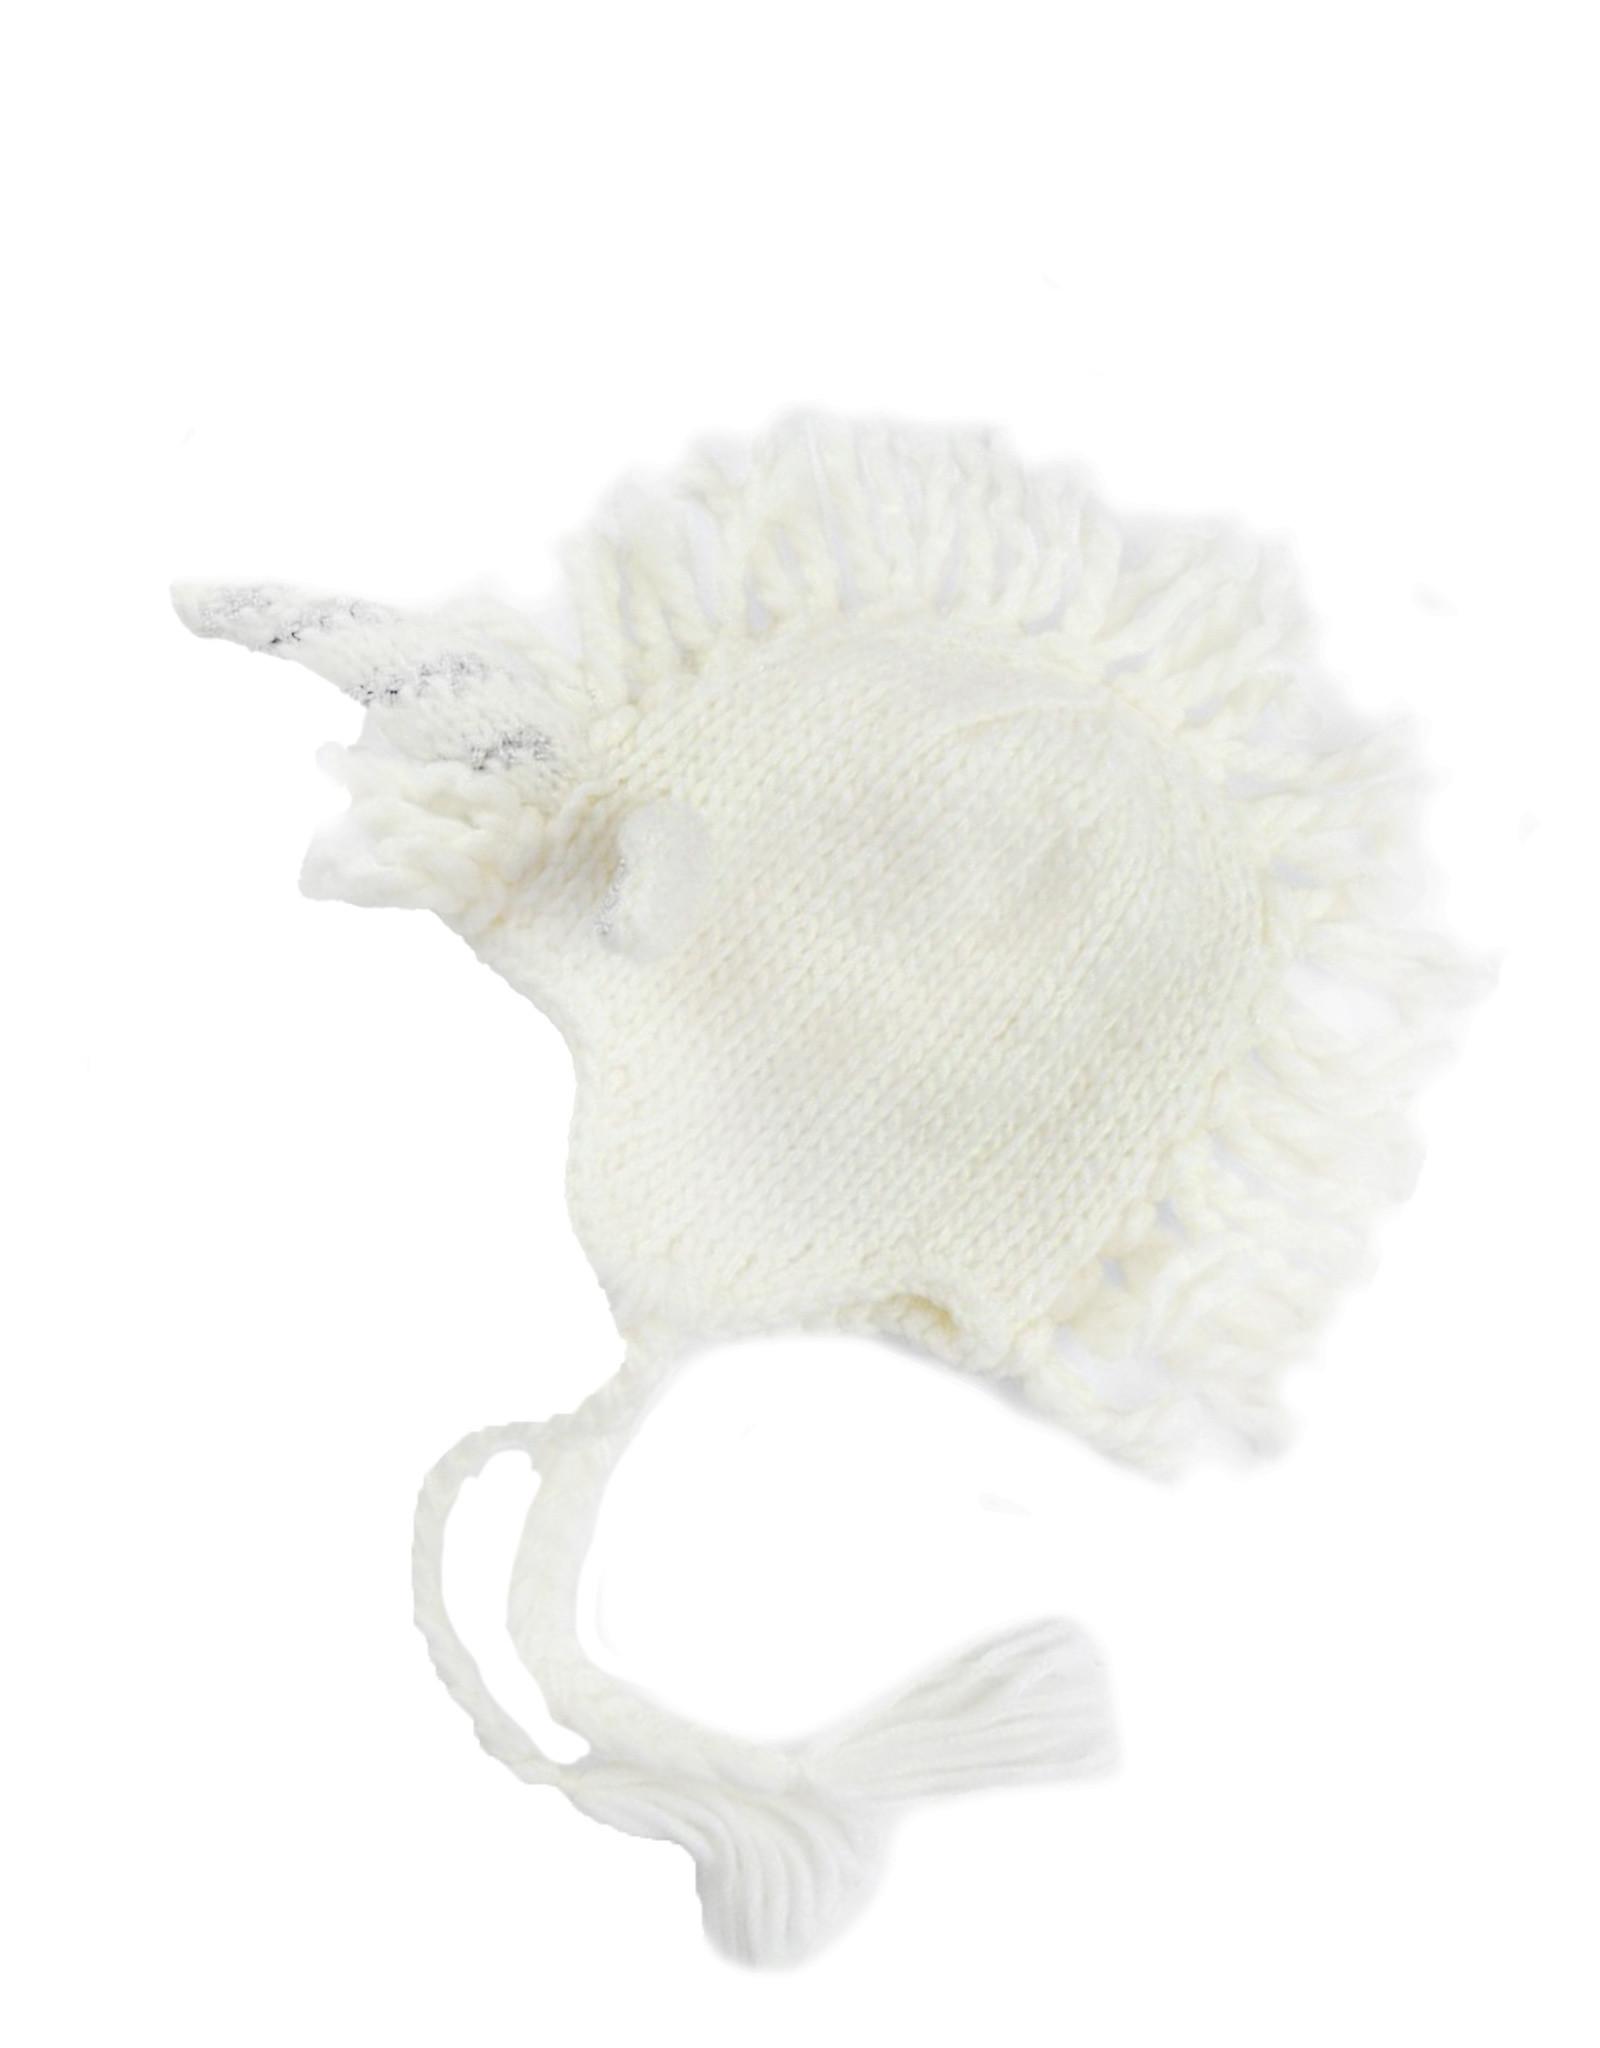 Blueberry Hill Knit Hat - White Unicorn